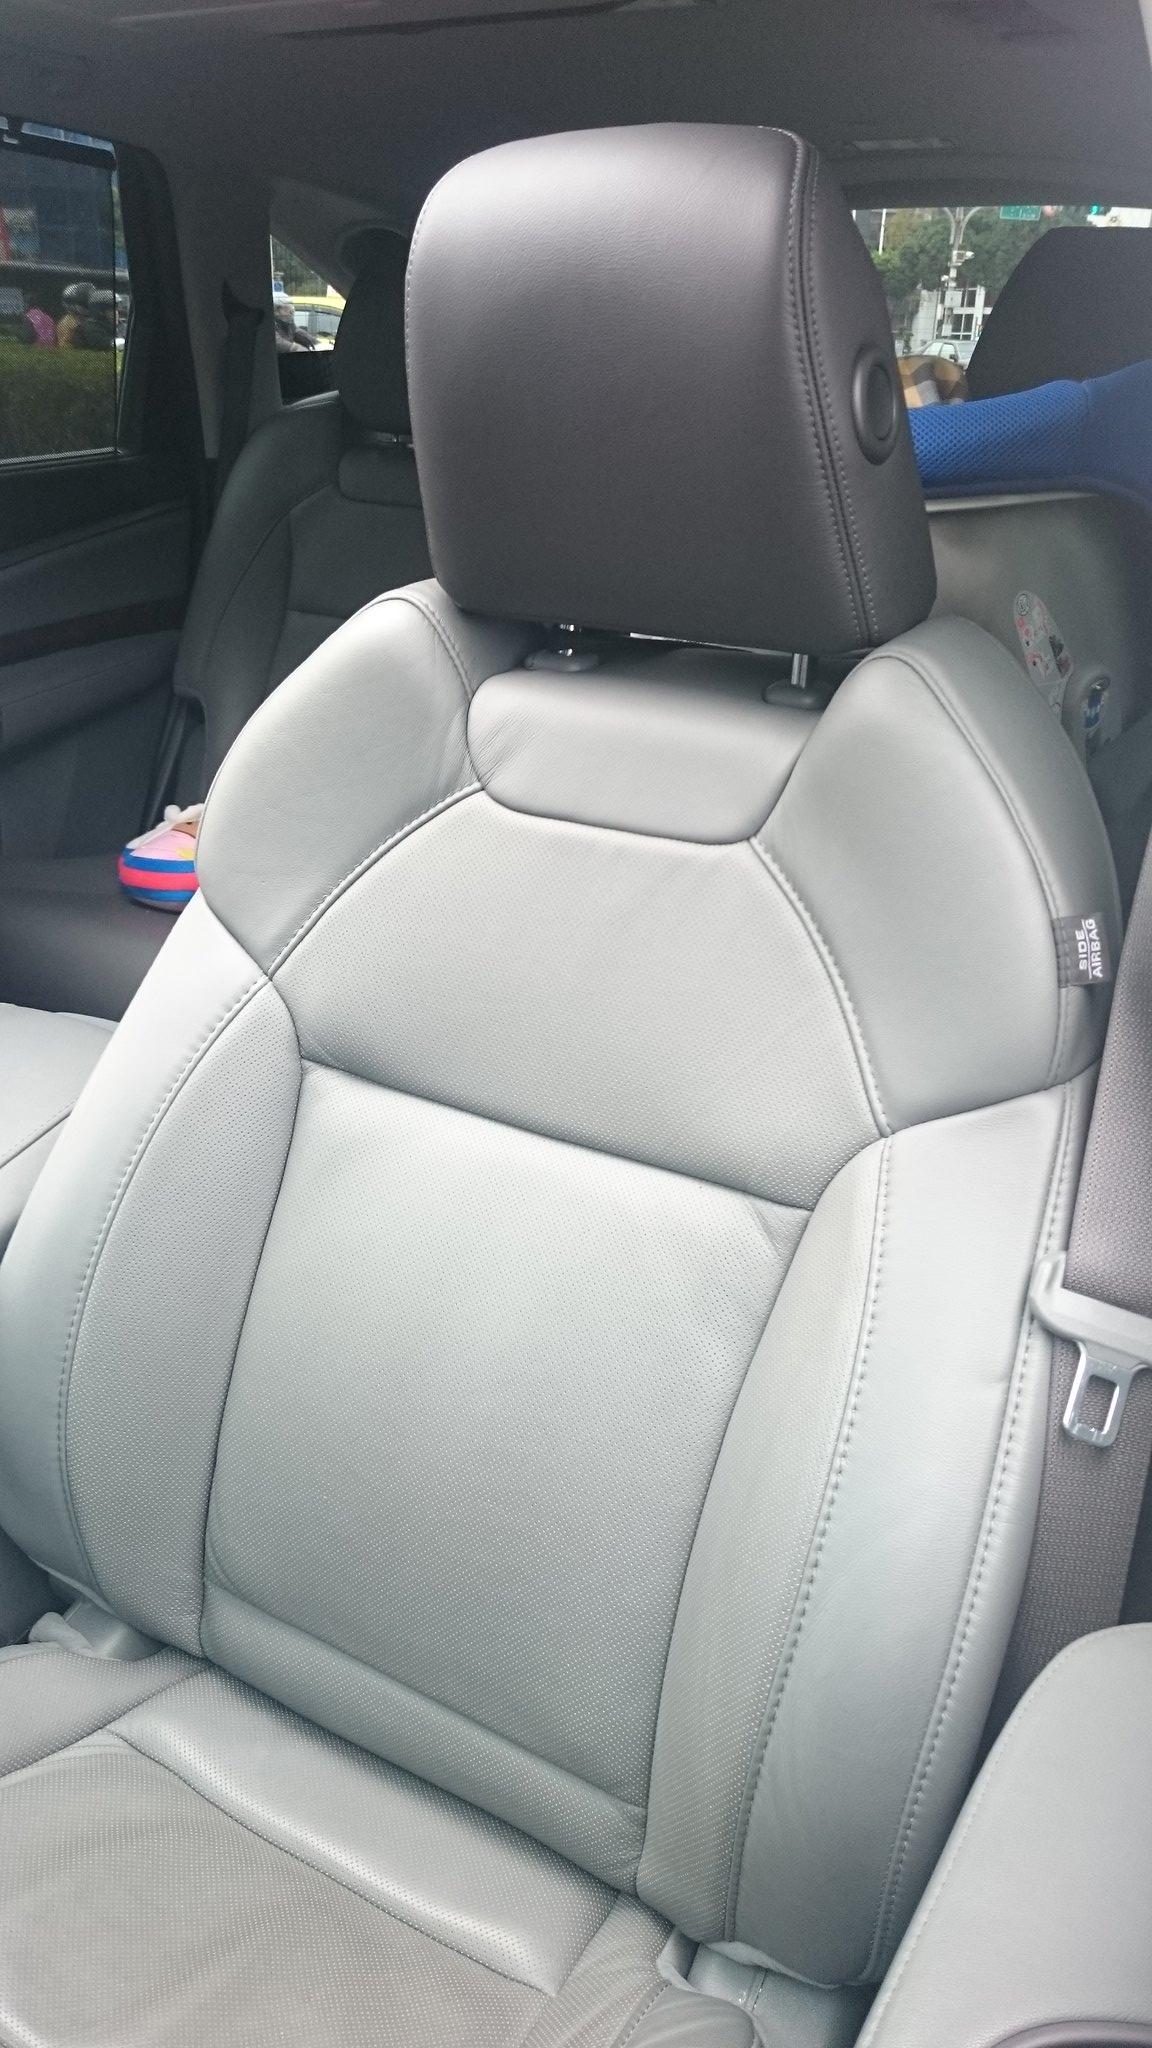 Acura Mdx Vs Rdx >> The angle adjustable headrest. - Acura MDX Forum : Acura